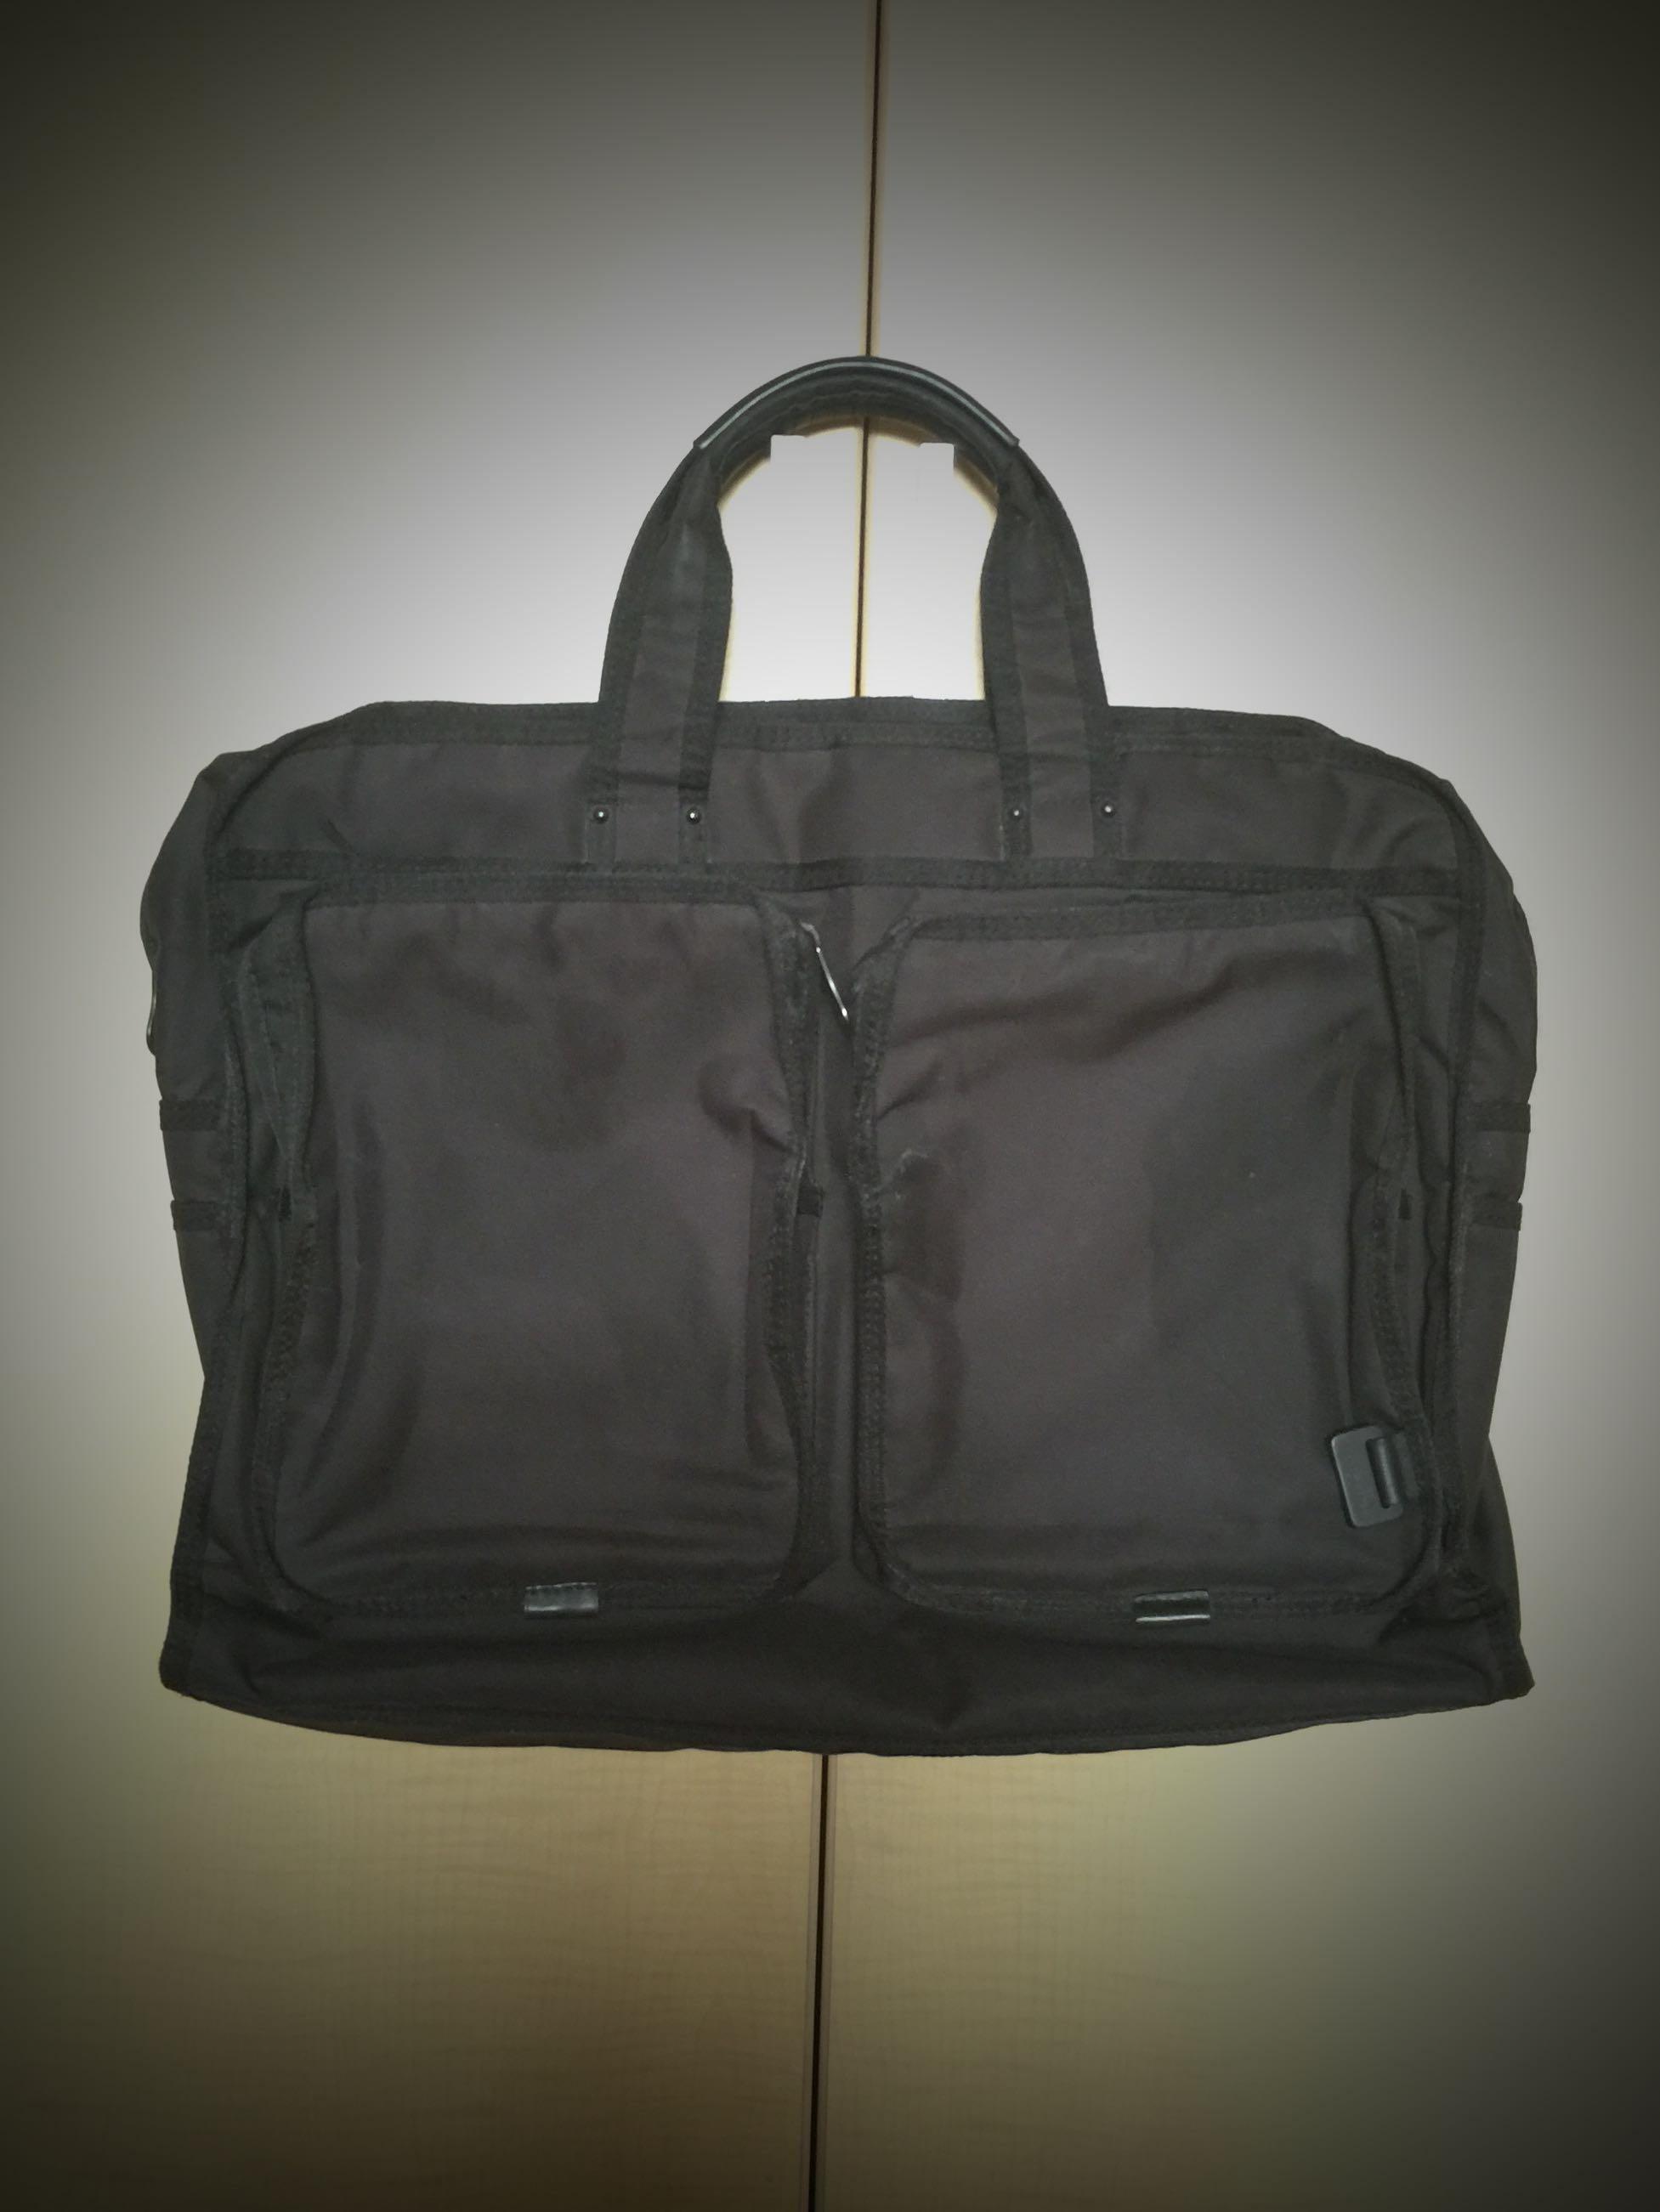 f24703d3aa Home · Luxury · Bags   Wallets · Handbags. photo photo photo photo photo